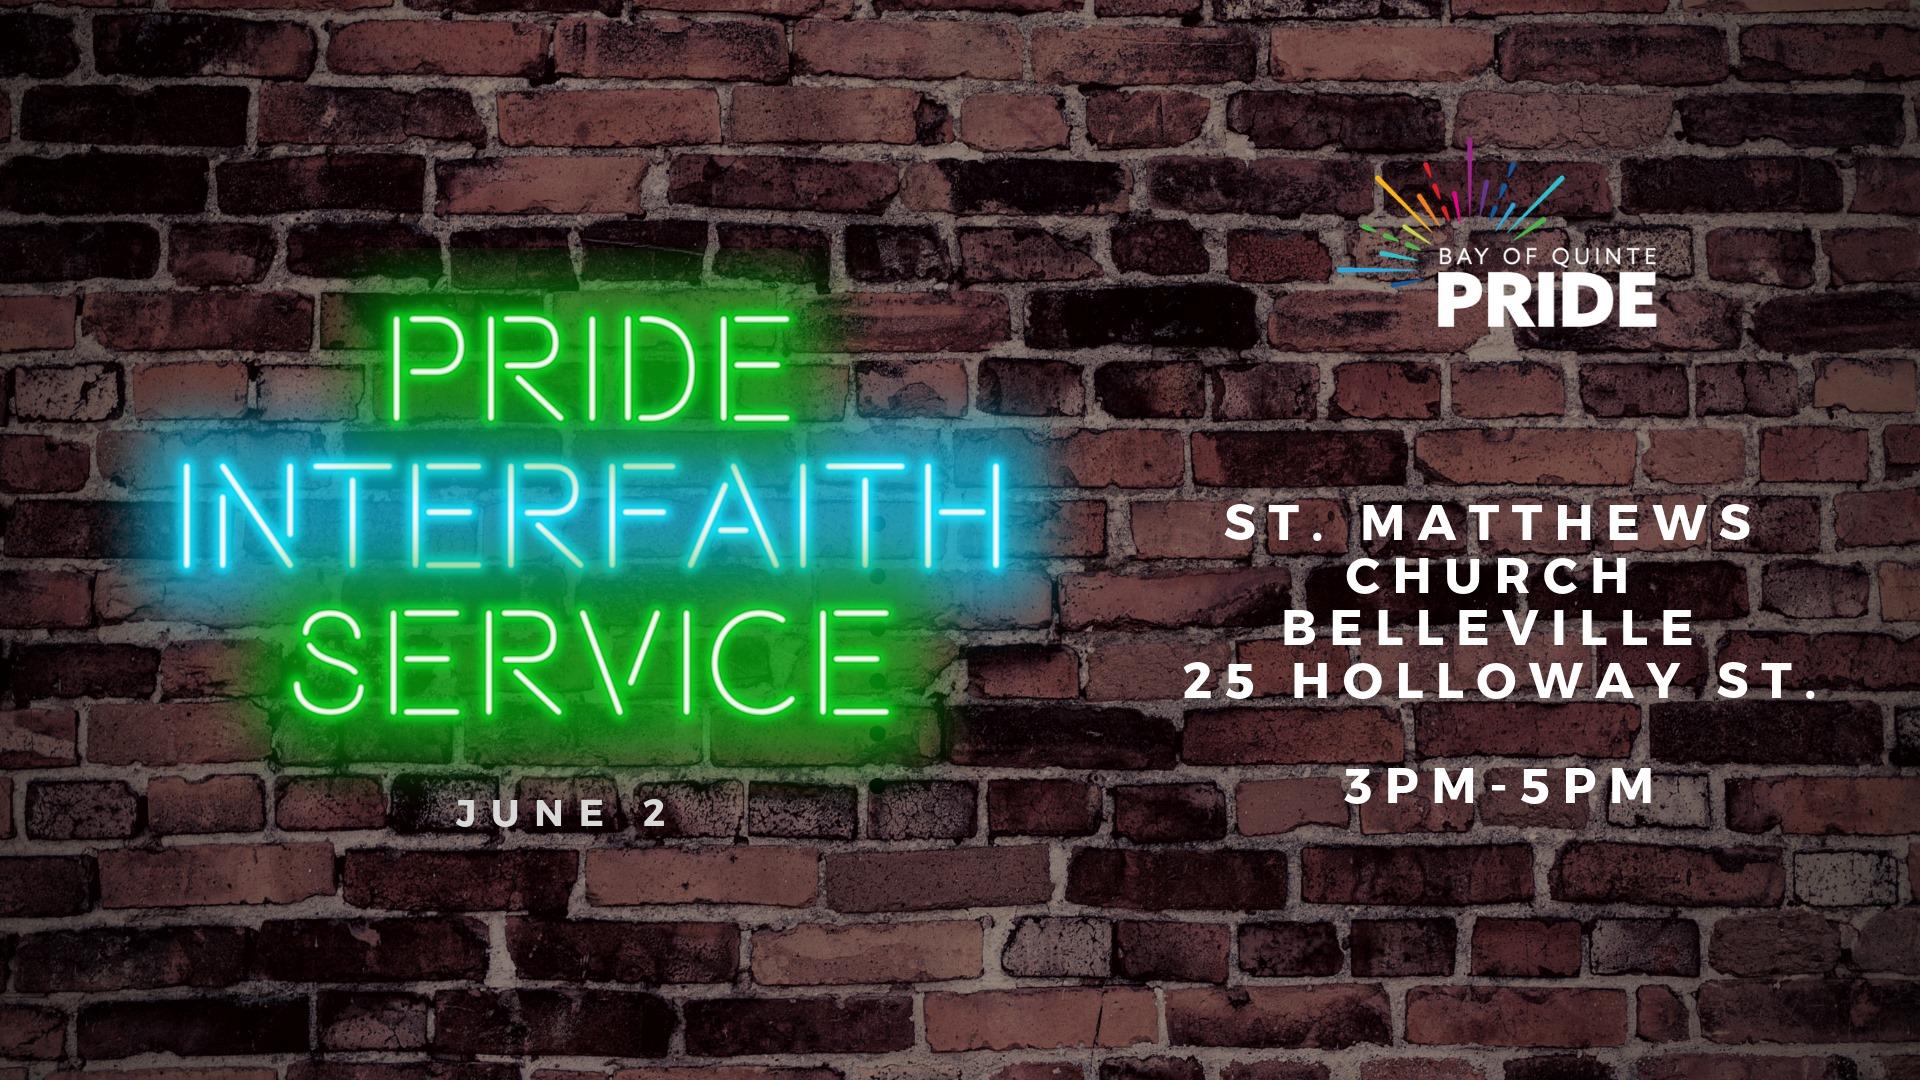 Pride Interfaith Service poster